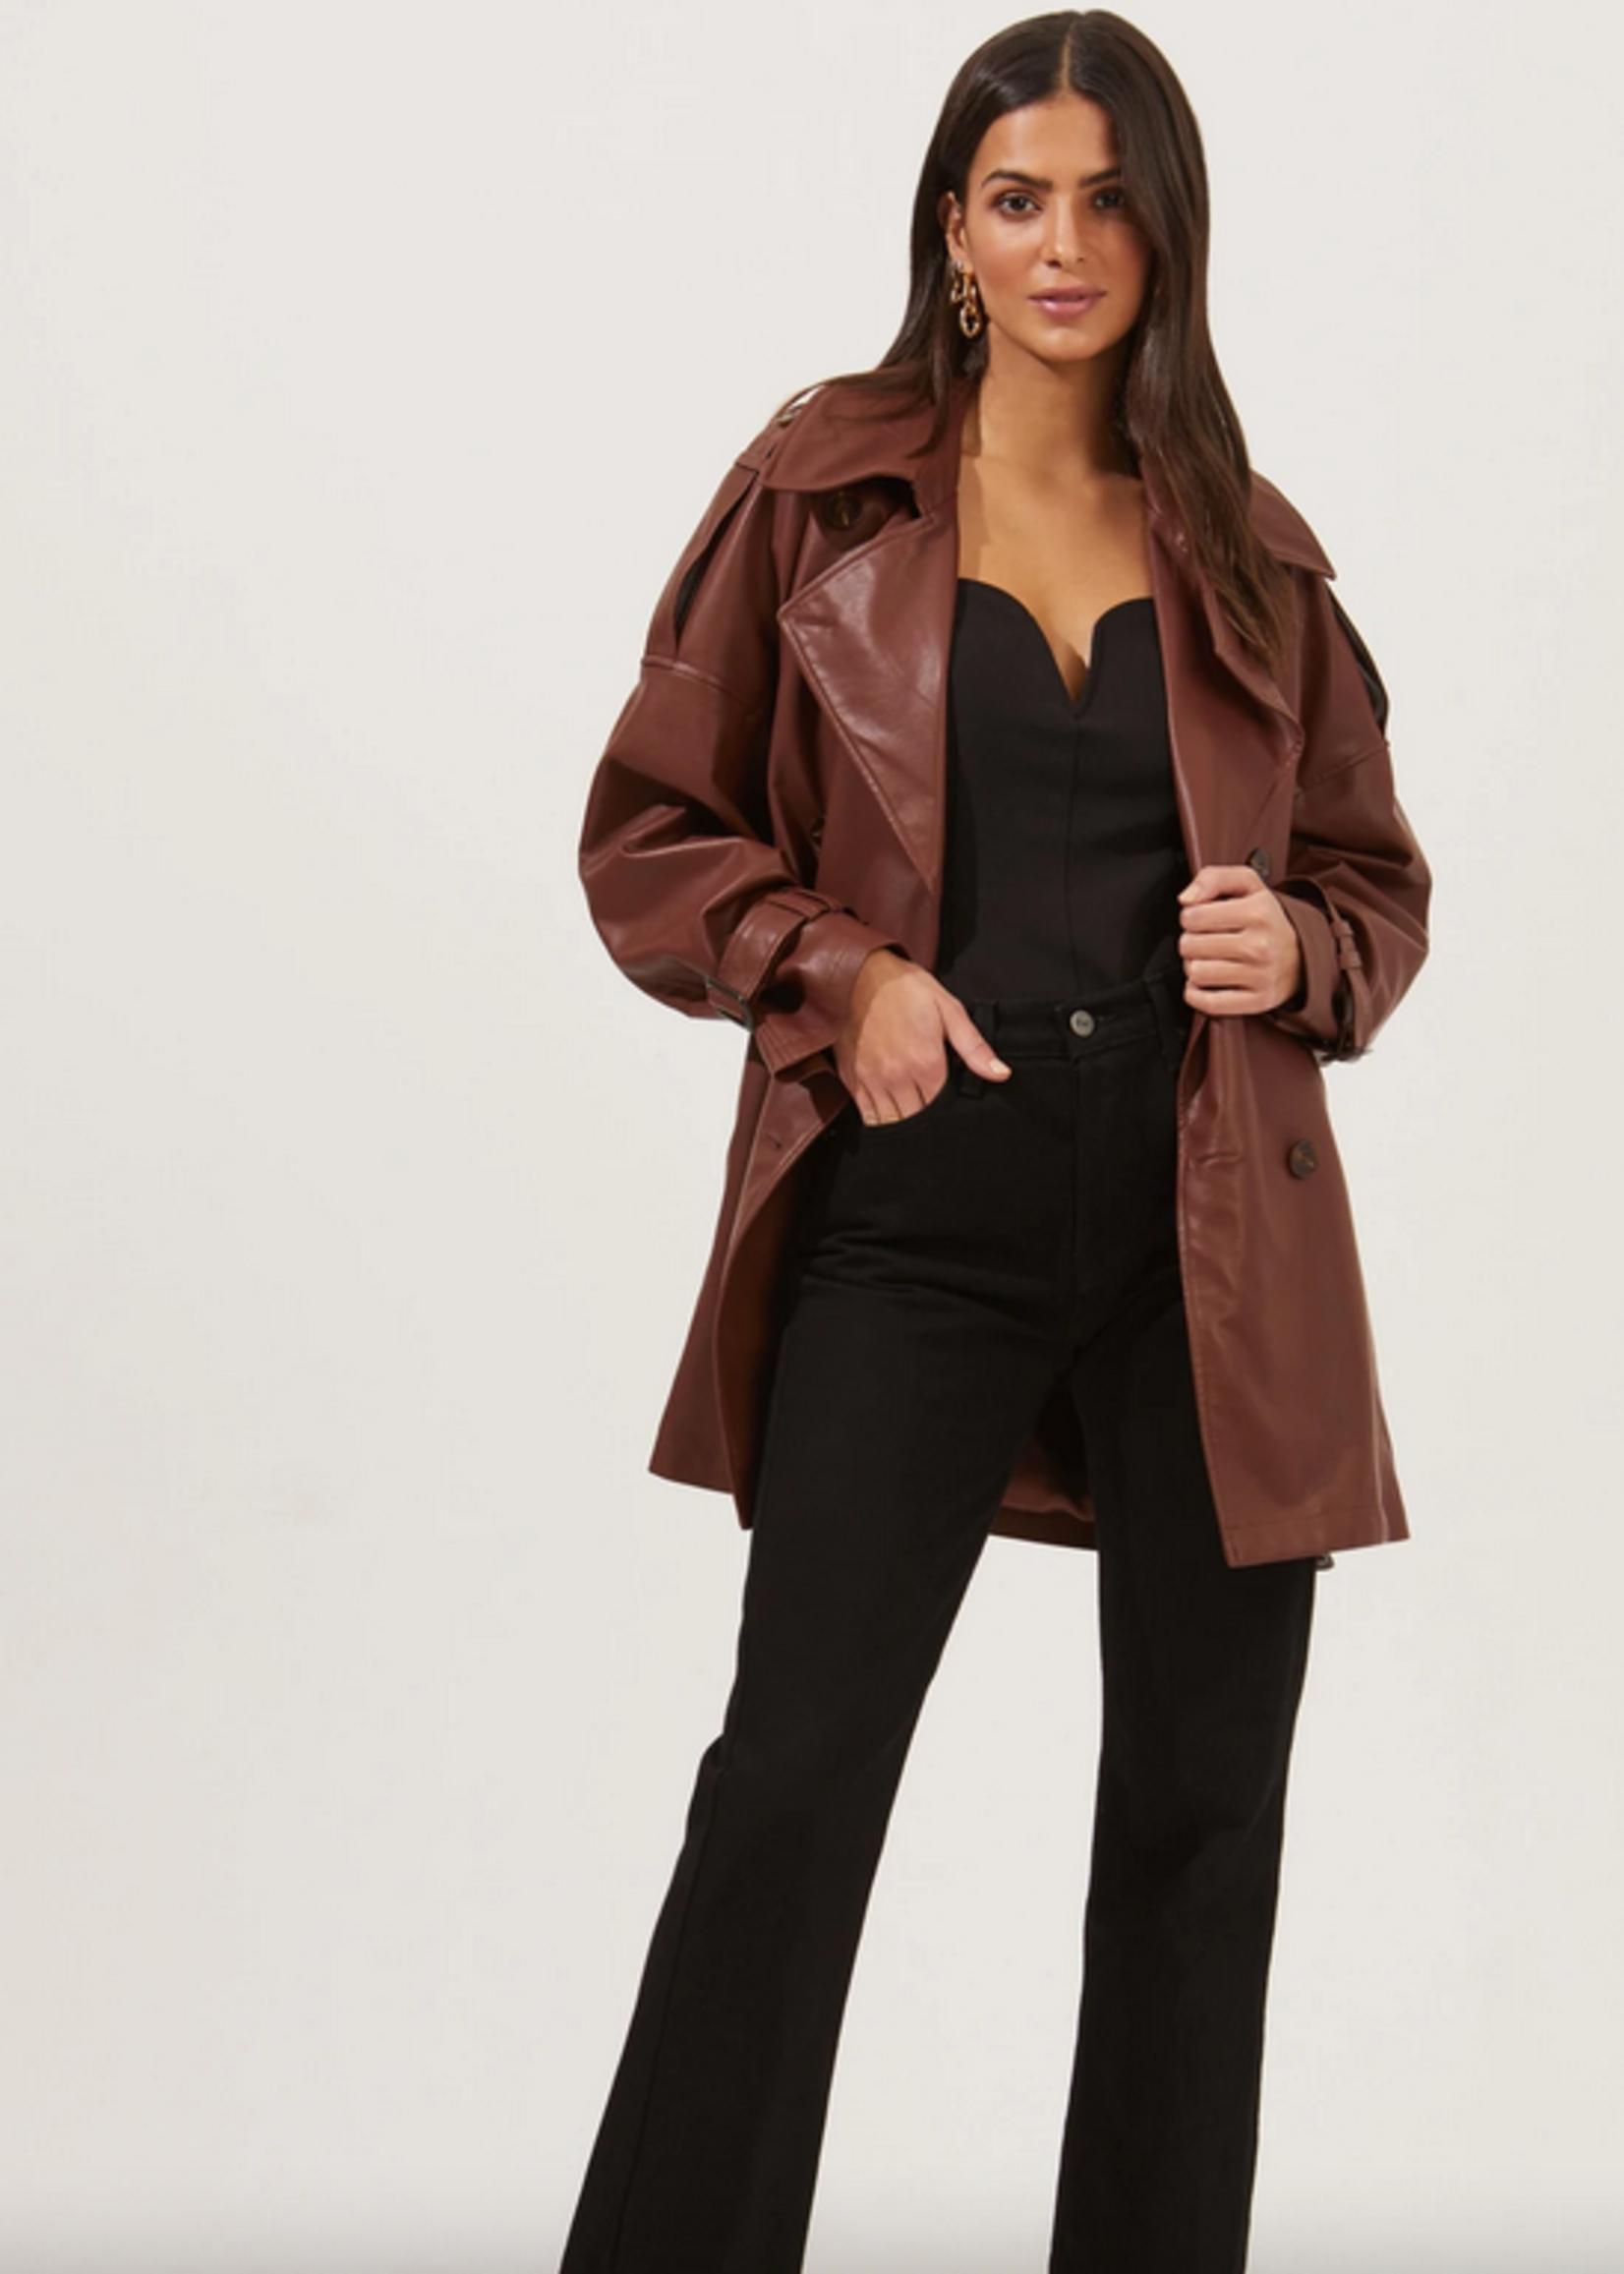 Elitaire Boutique Peoria Jacket in Rust Brown